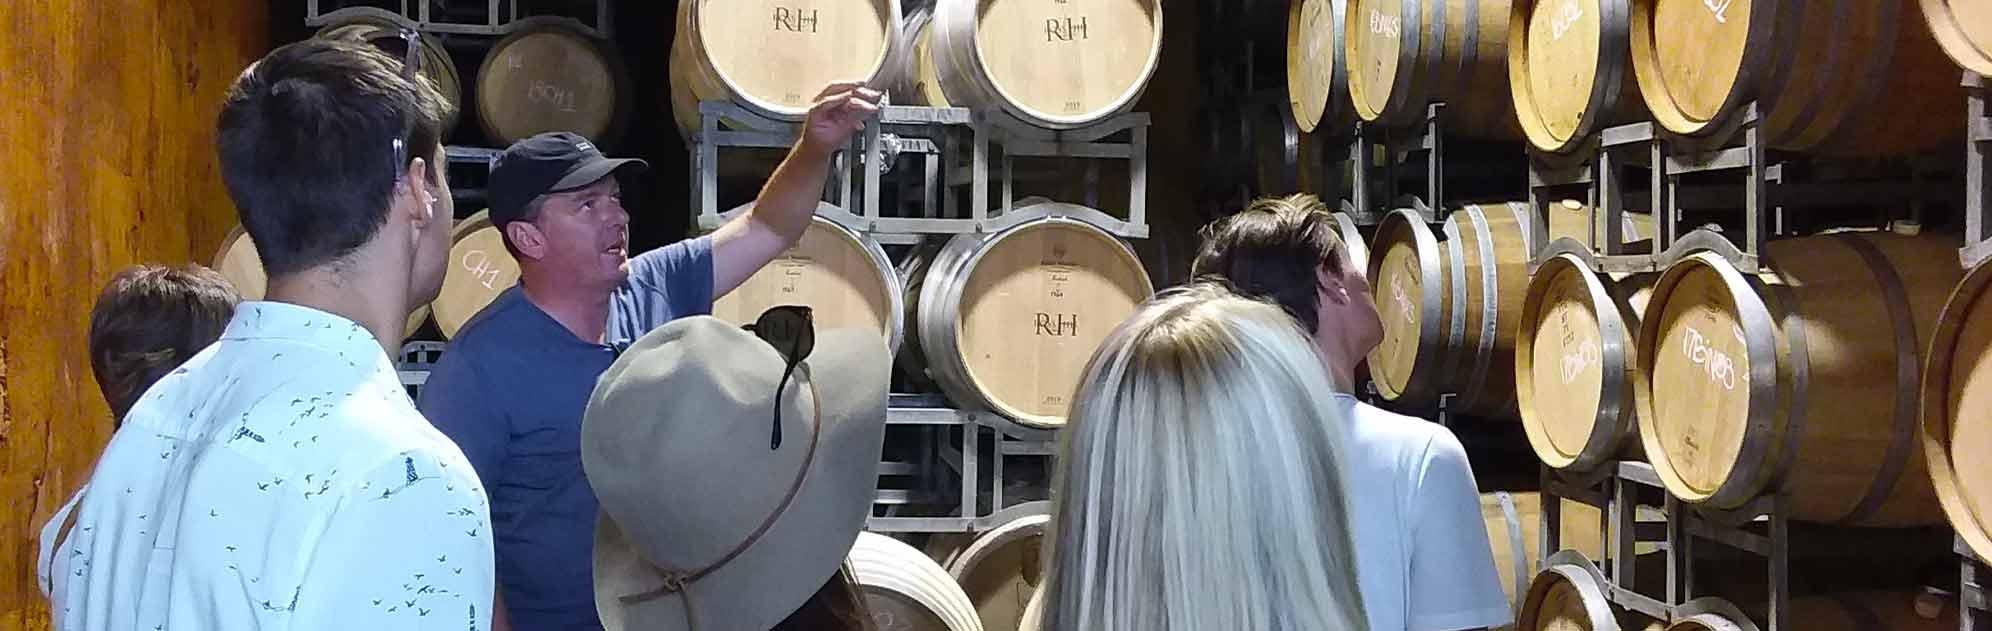 Wine tour barrels